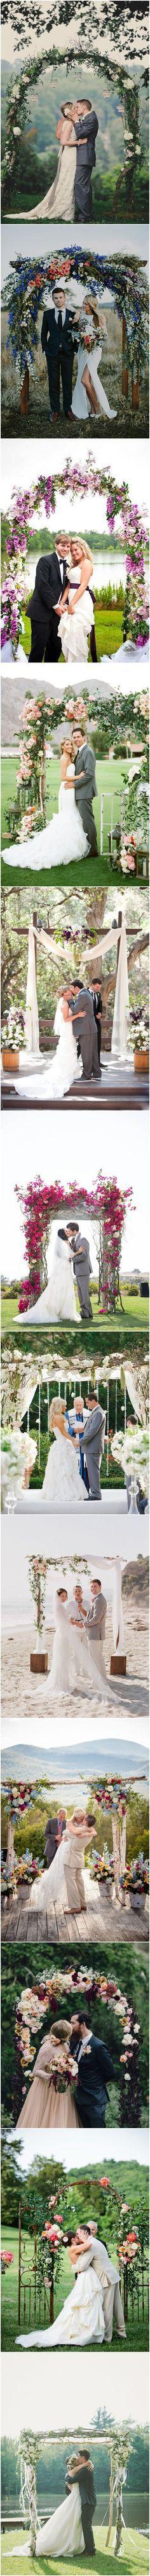 Rustic Wedding Ideas - 26 Floral Wedding Arches Decorating Ideas http://www.deerpearlflowers.com/26-floral-wedding-arches-decorating-ideas/